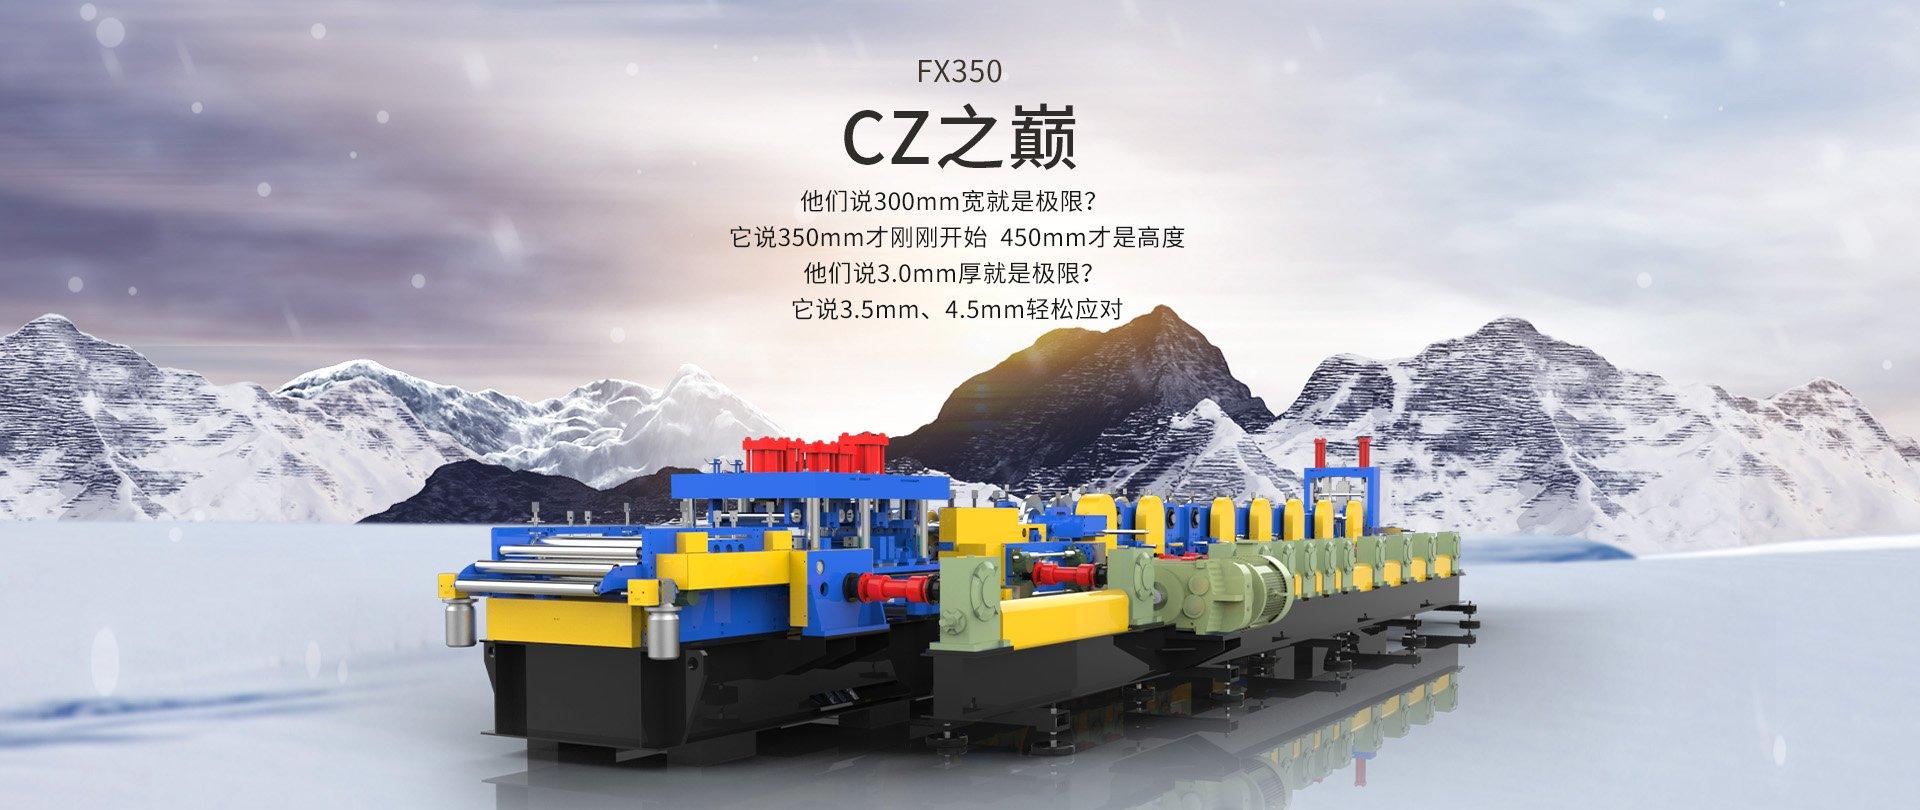 FX350